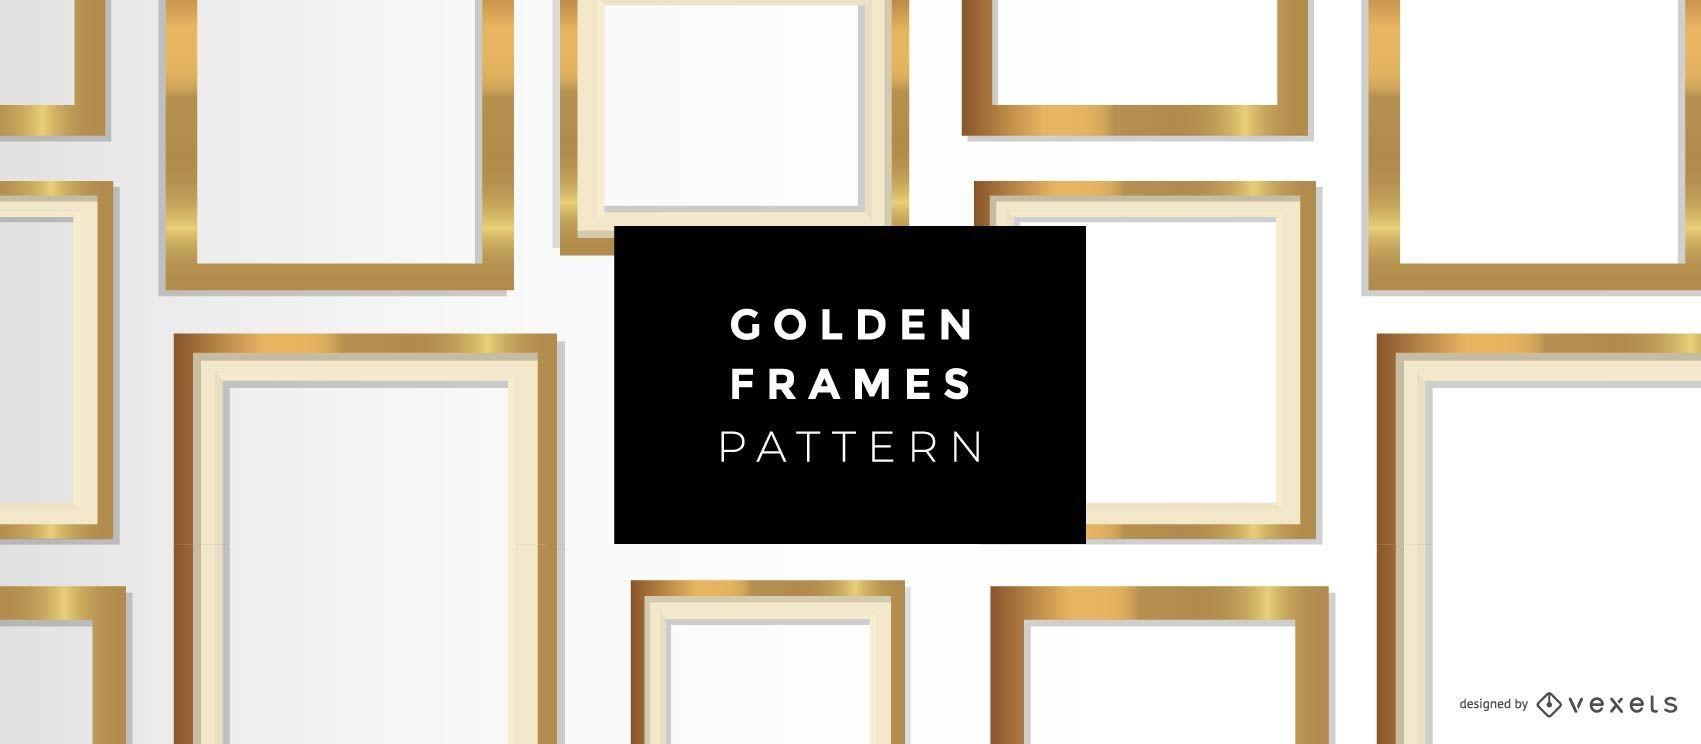 Golden frames pattern